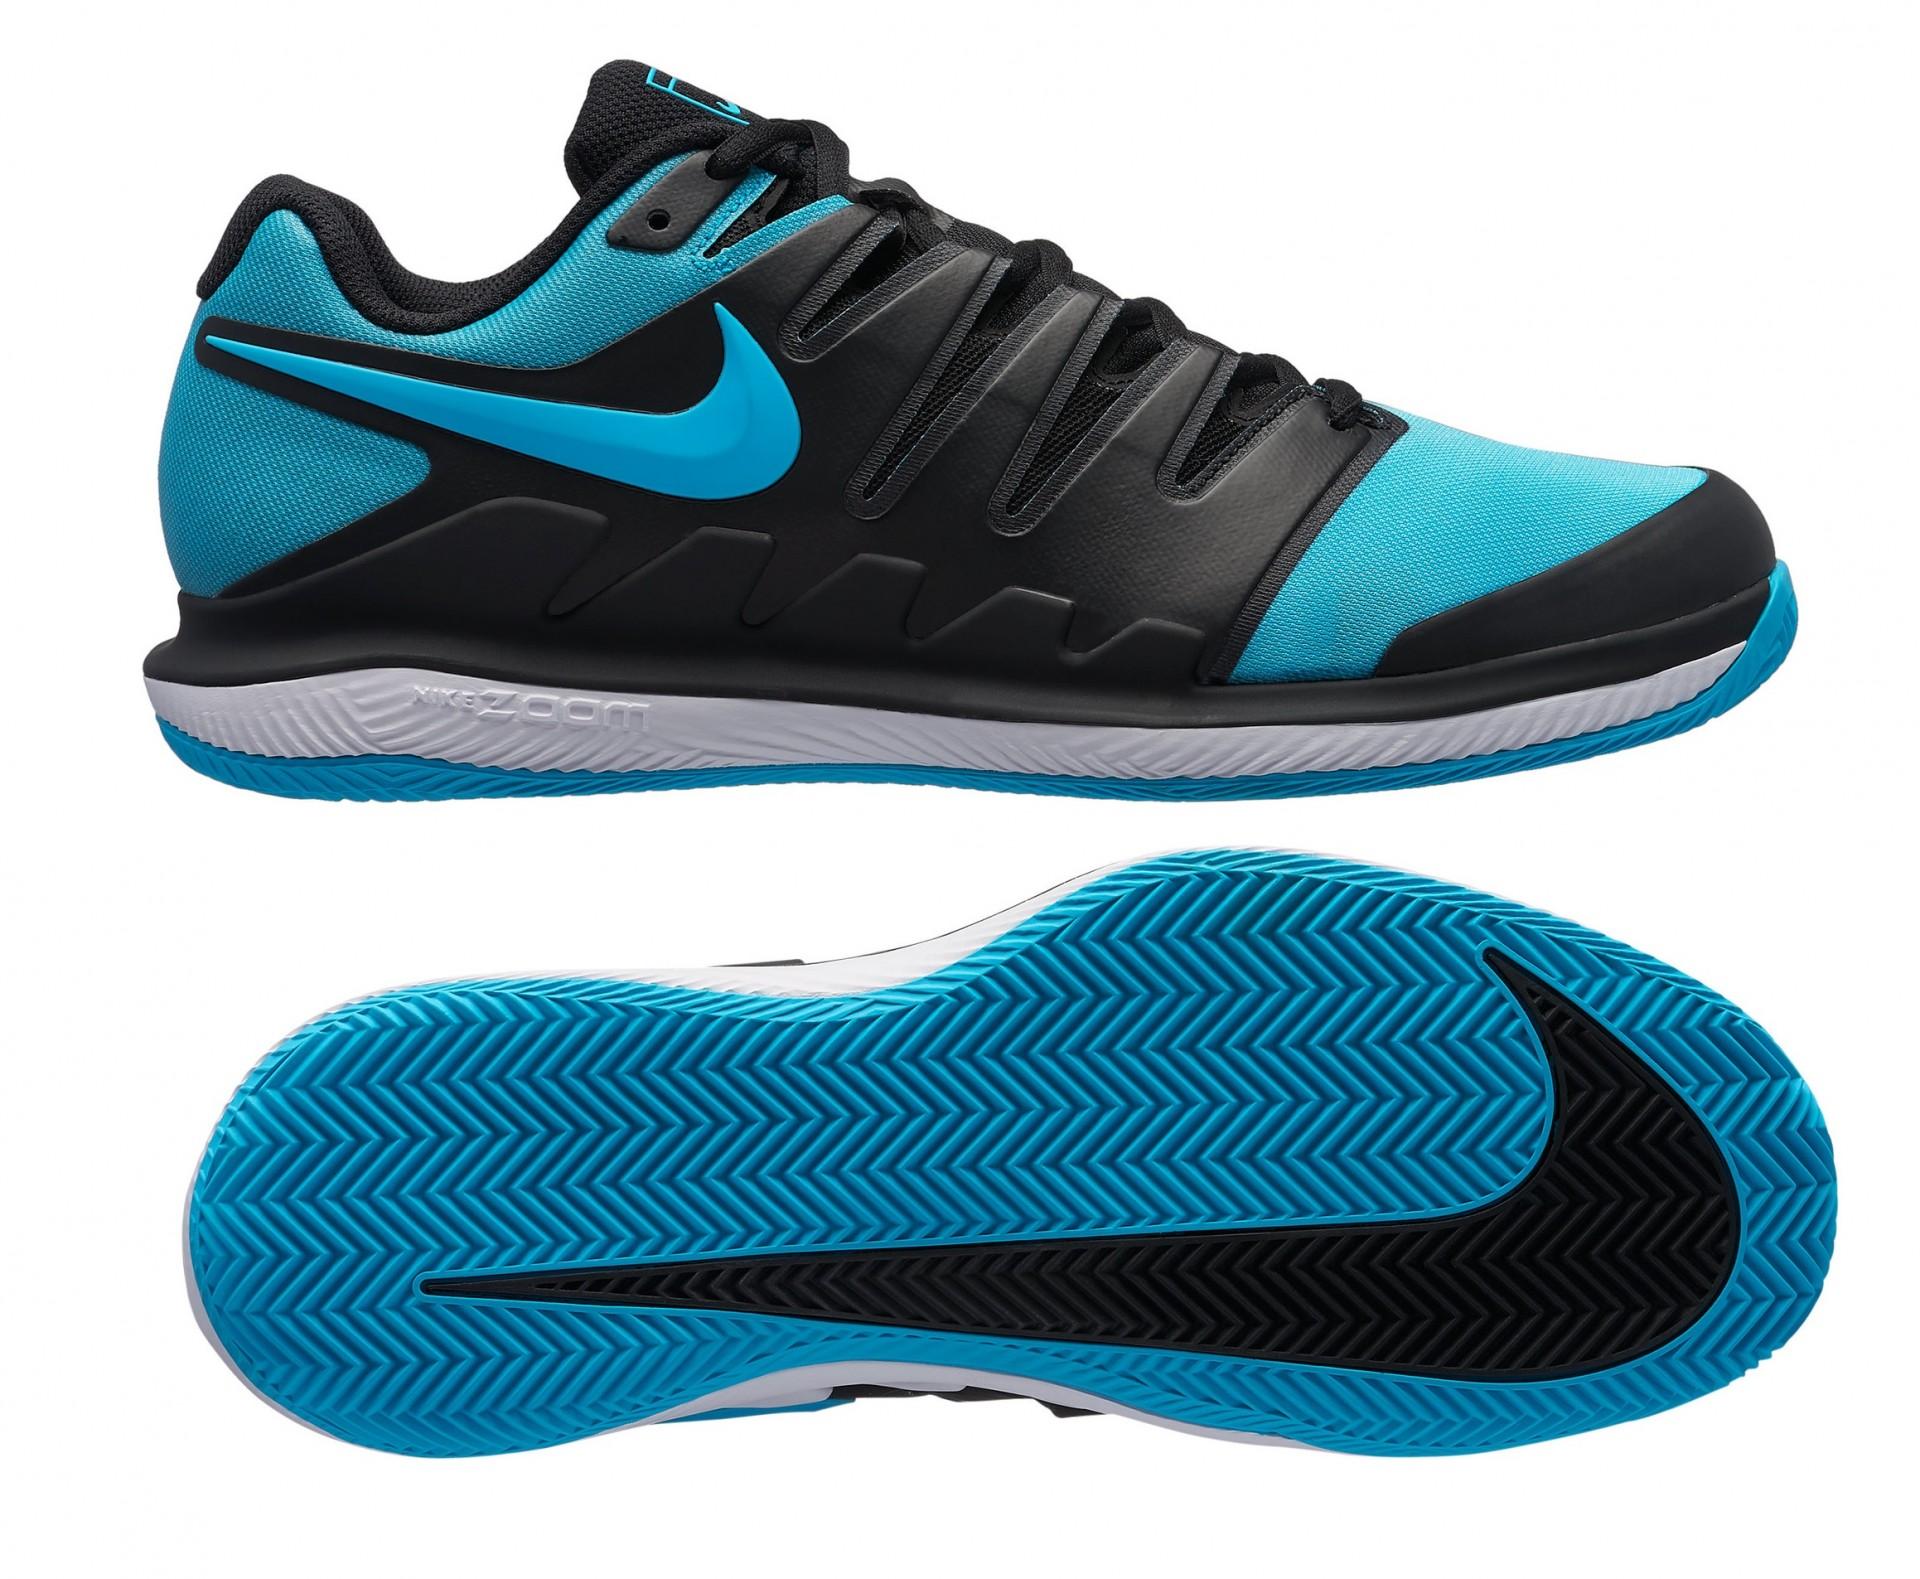 Kinder Tennisschuhe Nike Air Zoom Vapor X Clay | Tennislife.at